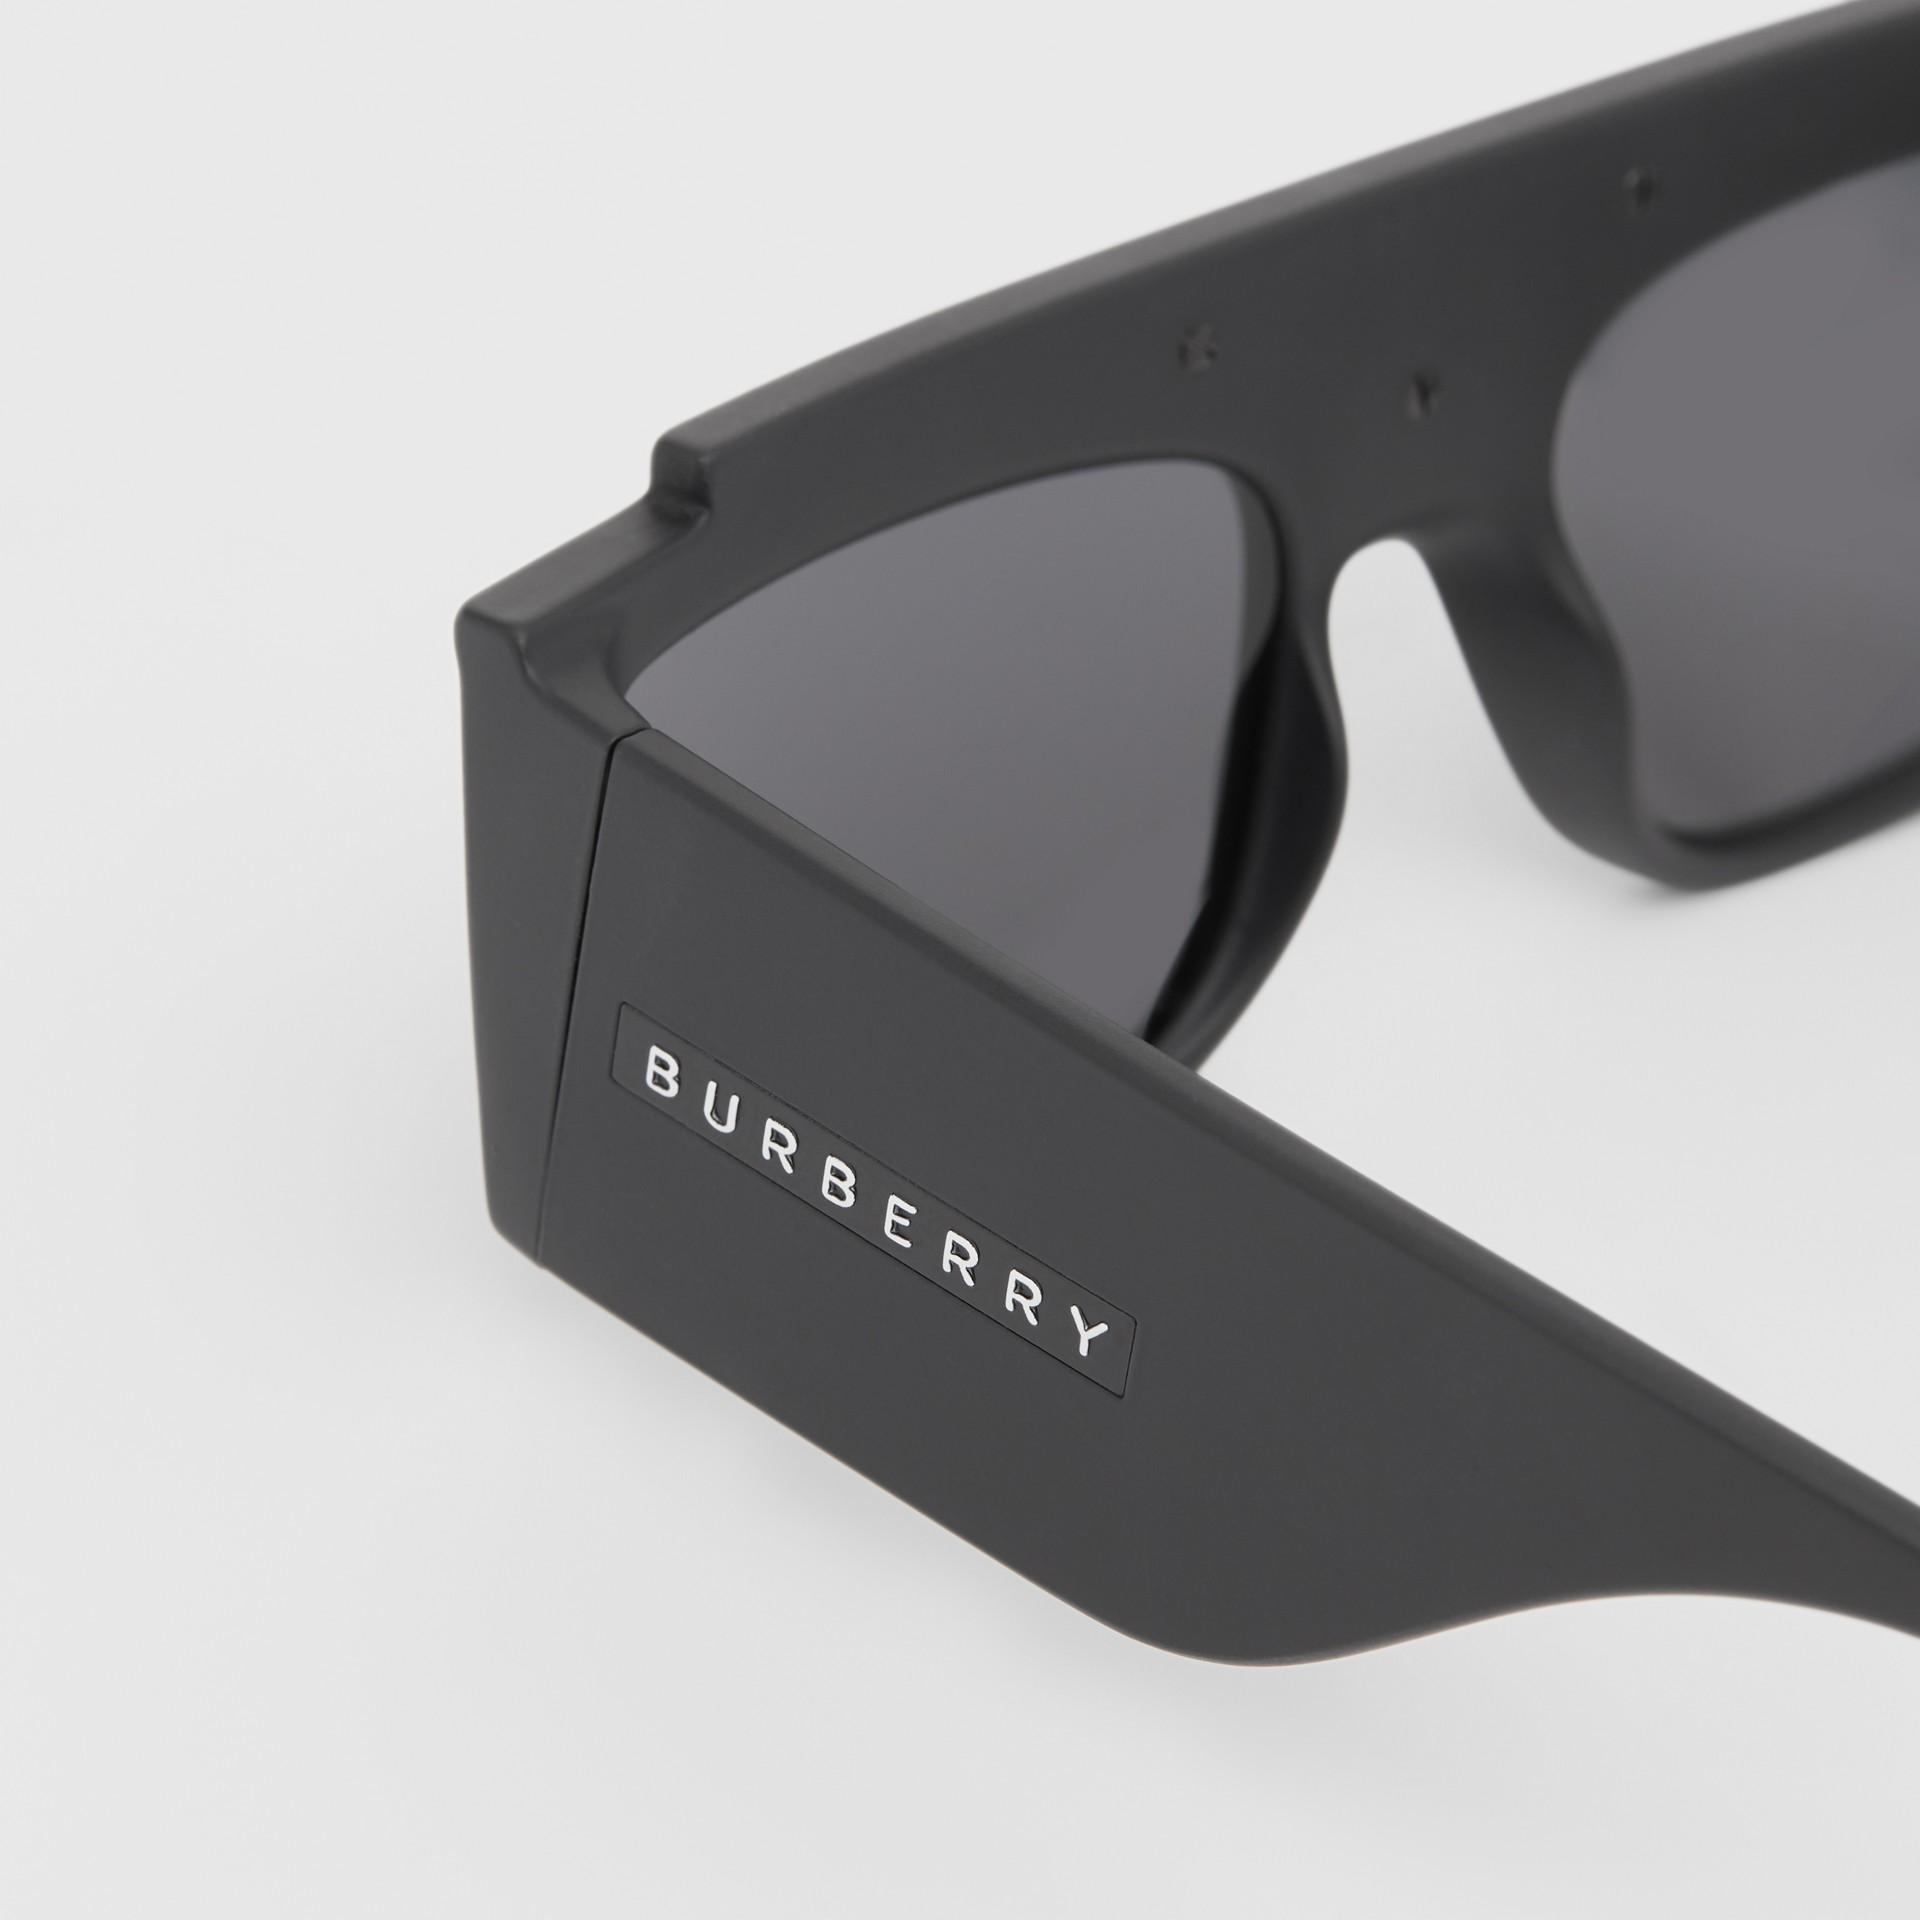 Rectangular Frame Sunglasses in Black - Women | Burberry - gallery image 1